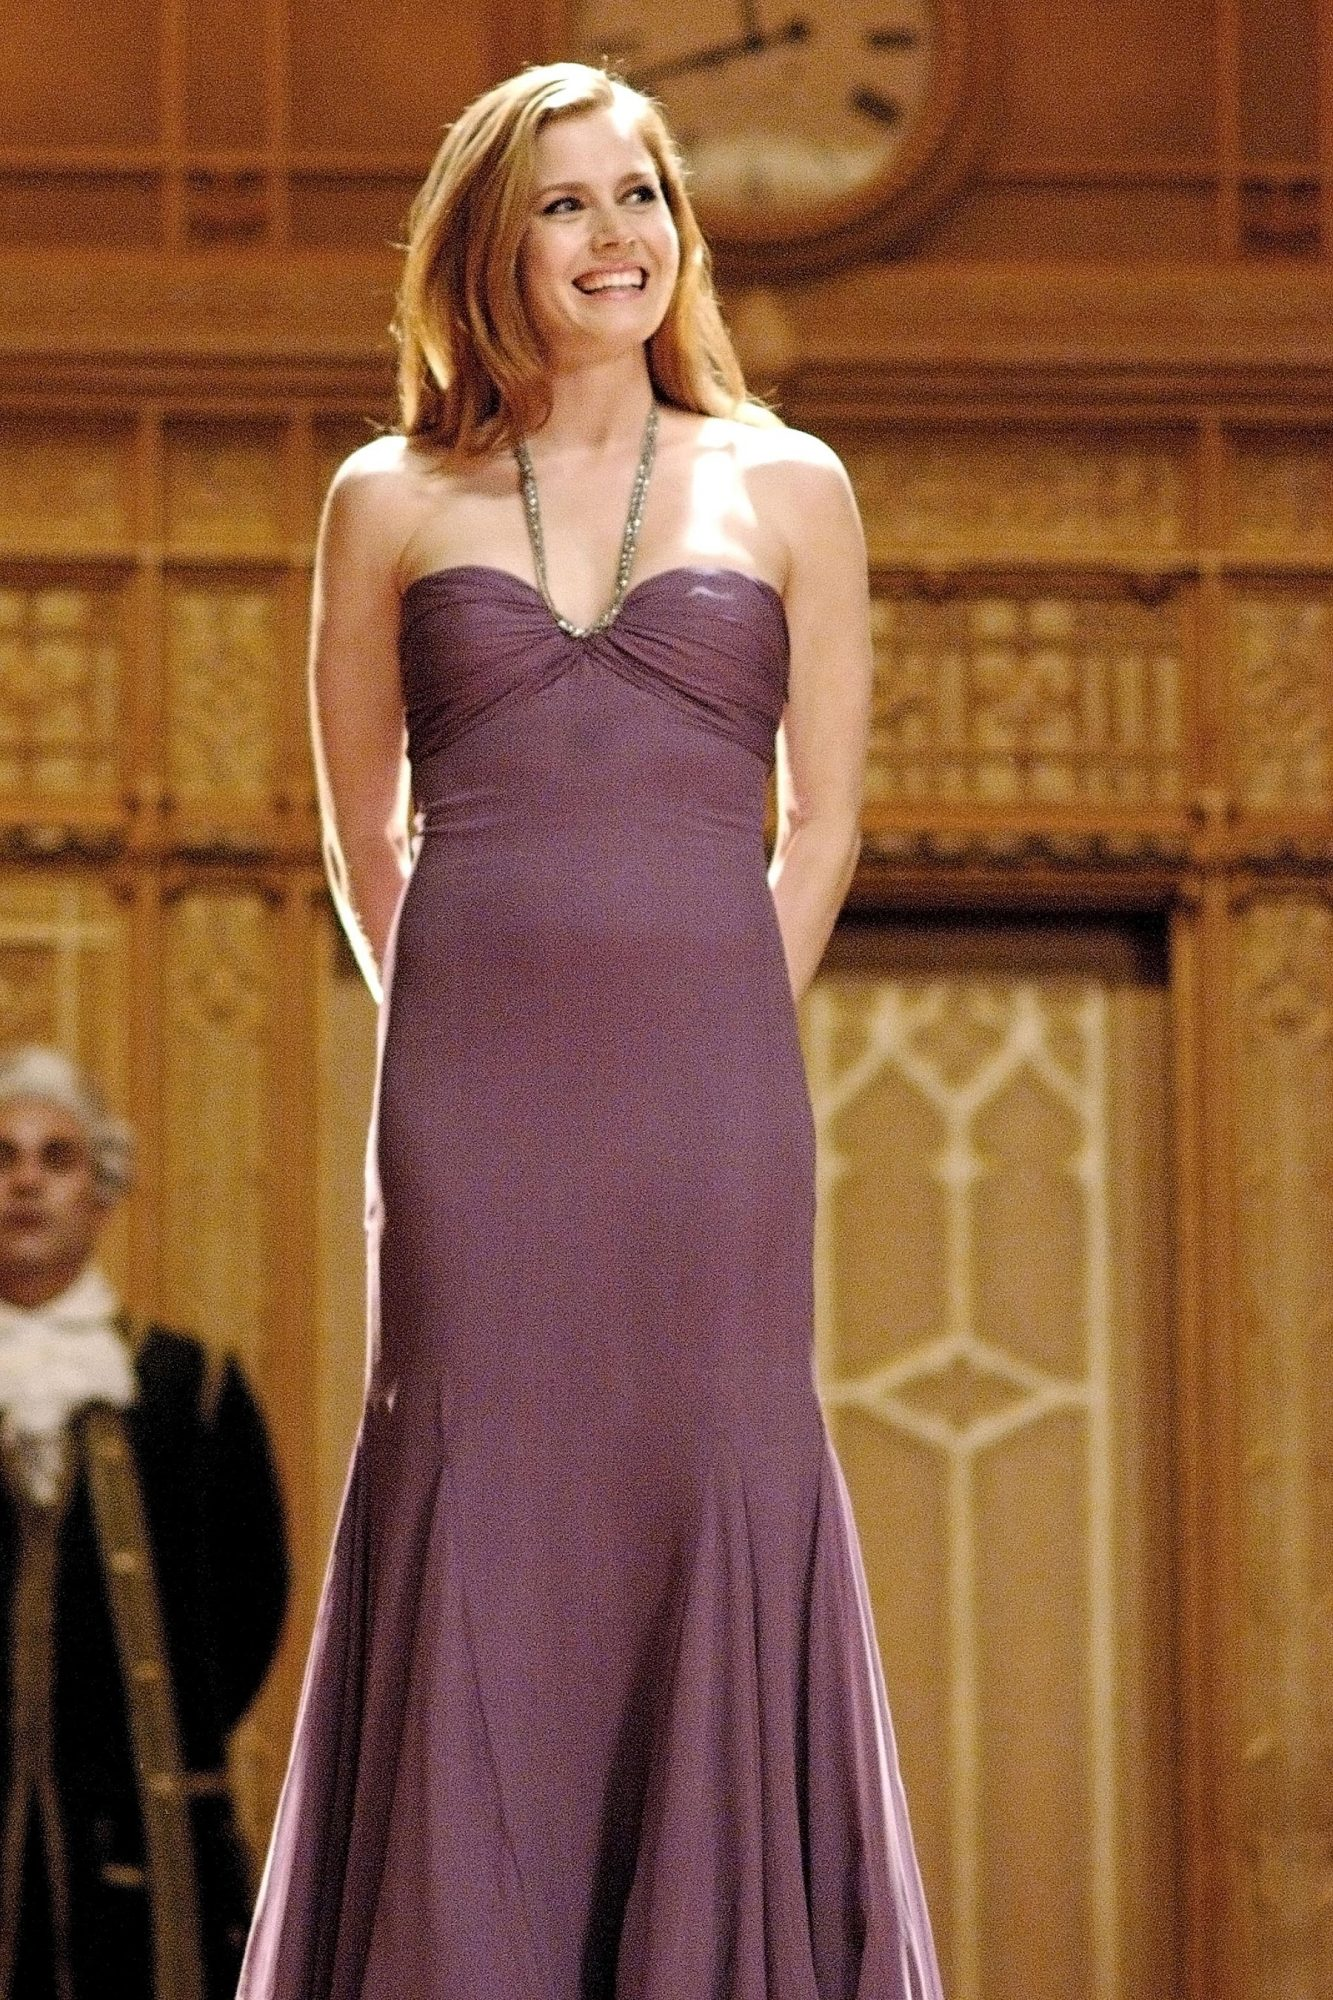 ENCHANTED, Amy Adams, 2007. ©Buena Vista Pictures/courtesy Everett Collection